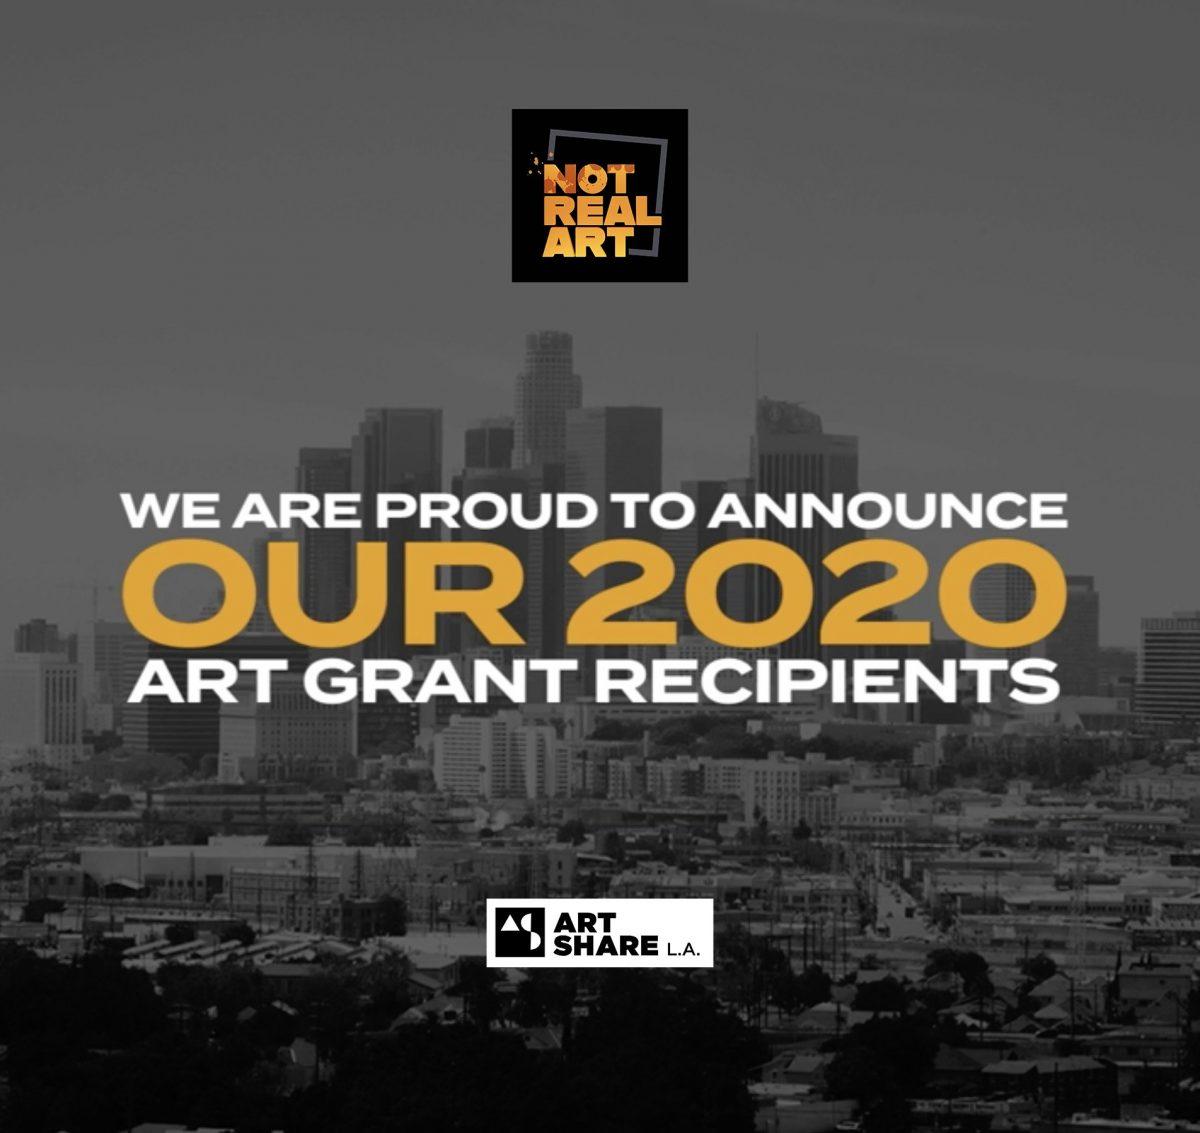 NOT REAL ART Announces Its 2020 Grant Recipients: Breaking News